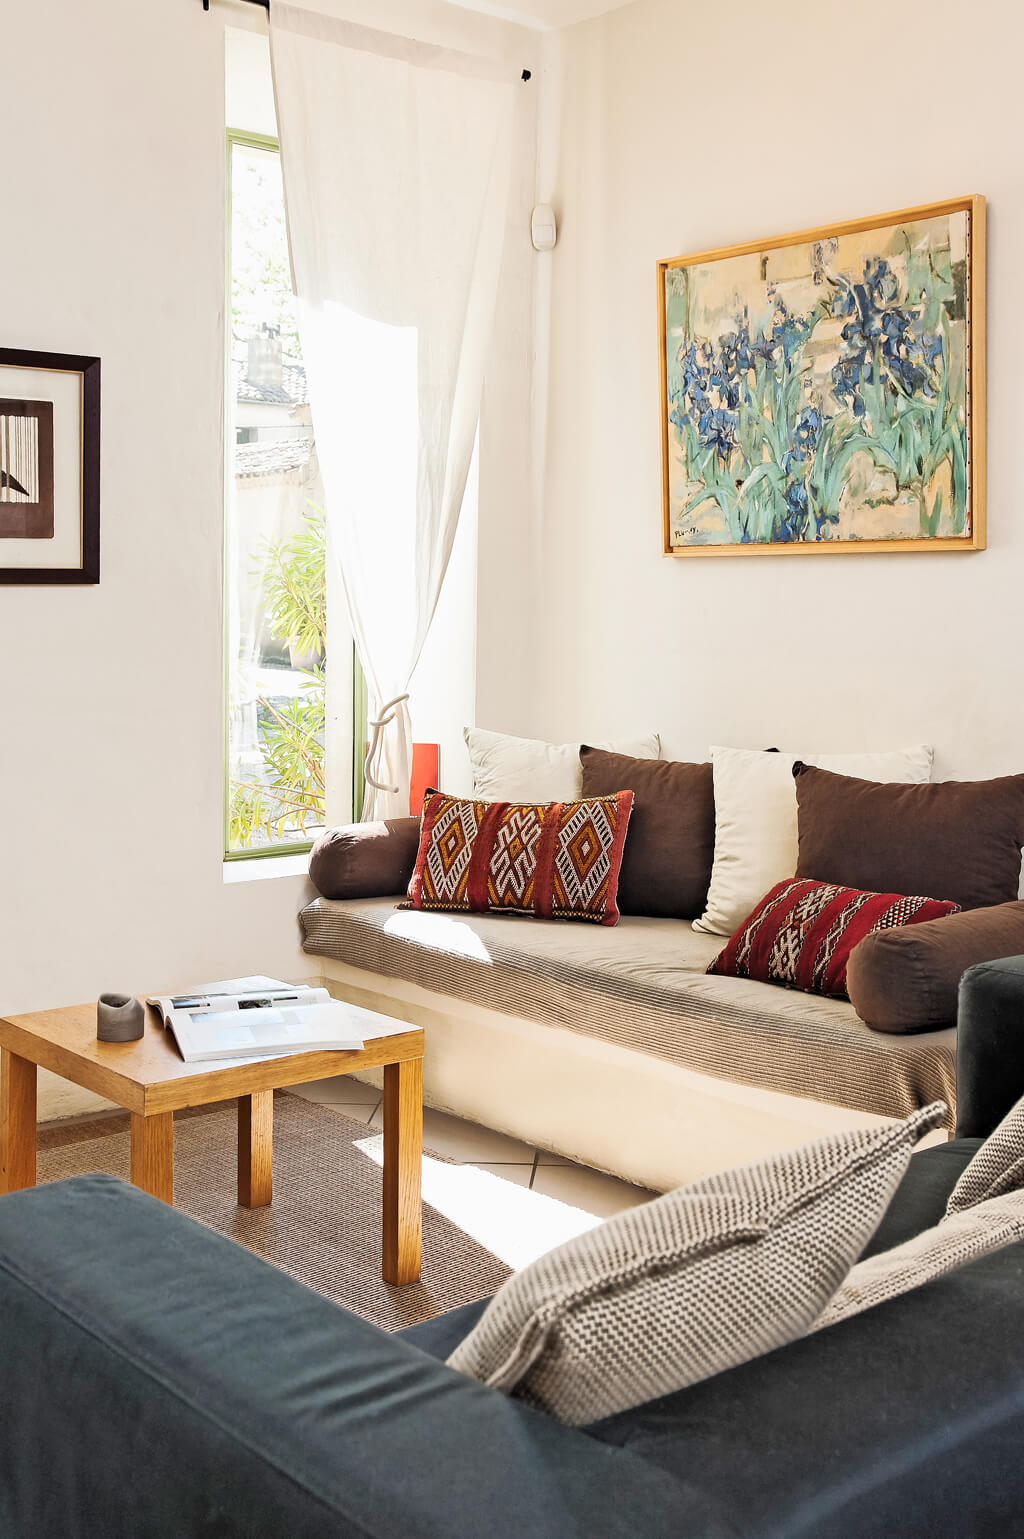 hip chair rental vinyl repair provence villa cairanne 5bdr haven in